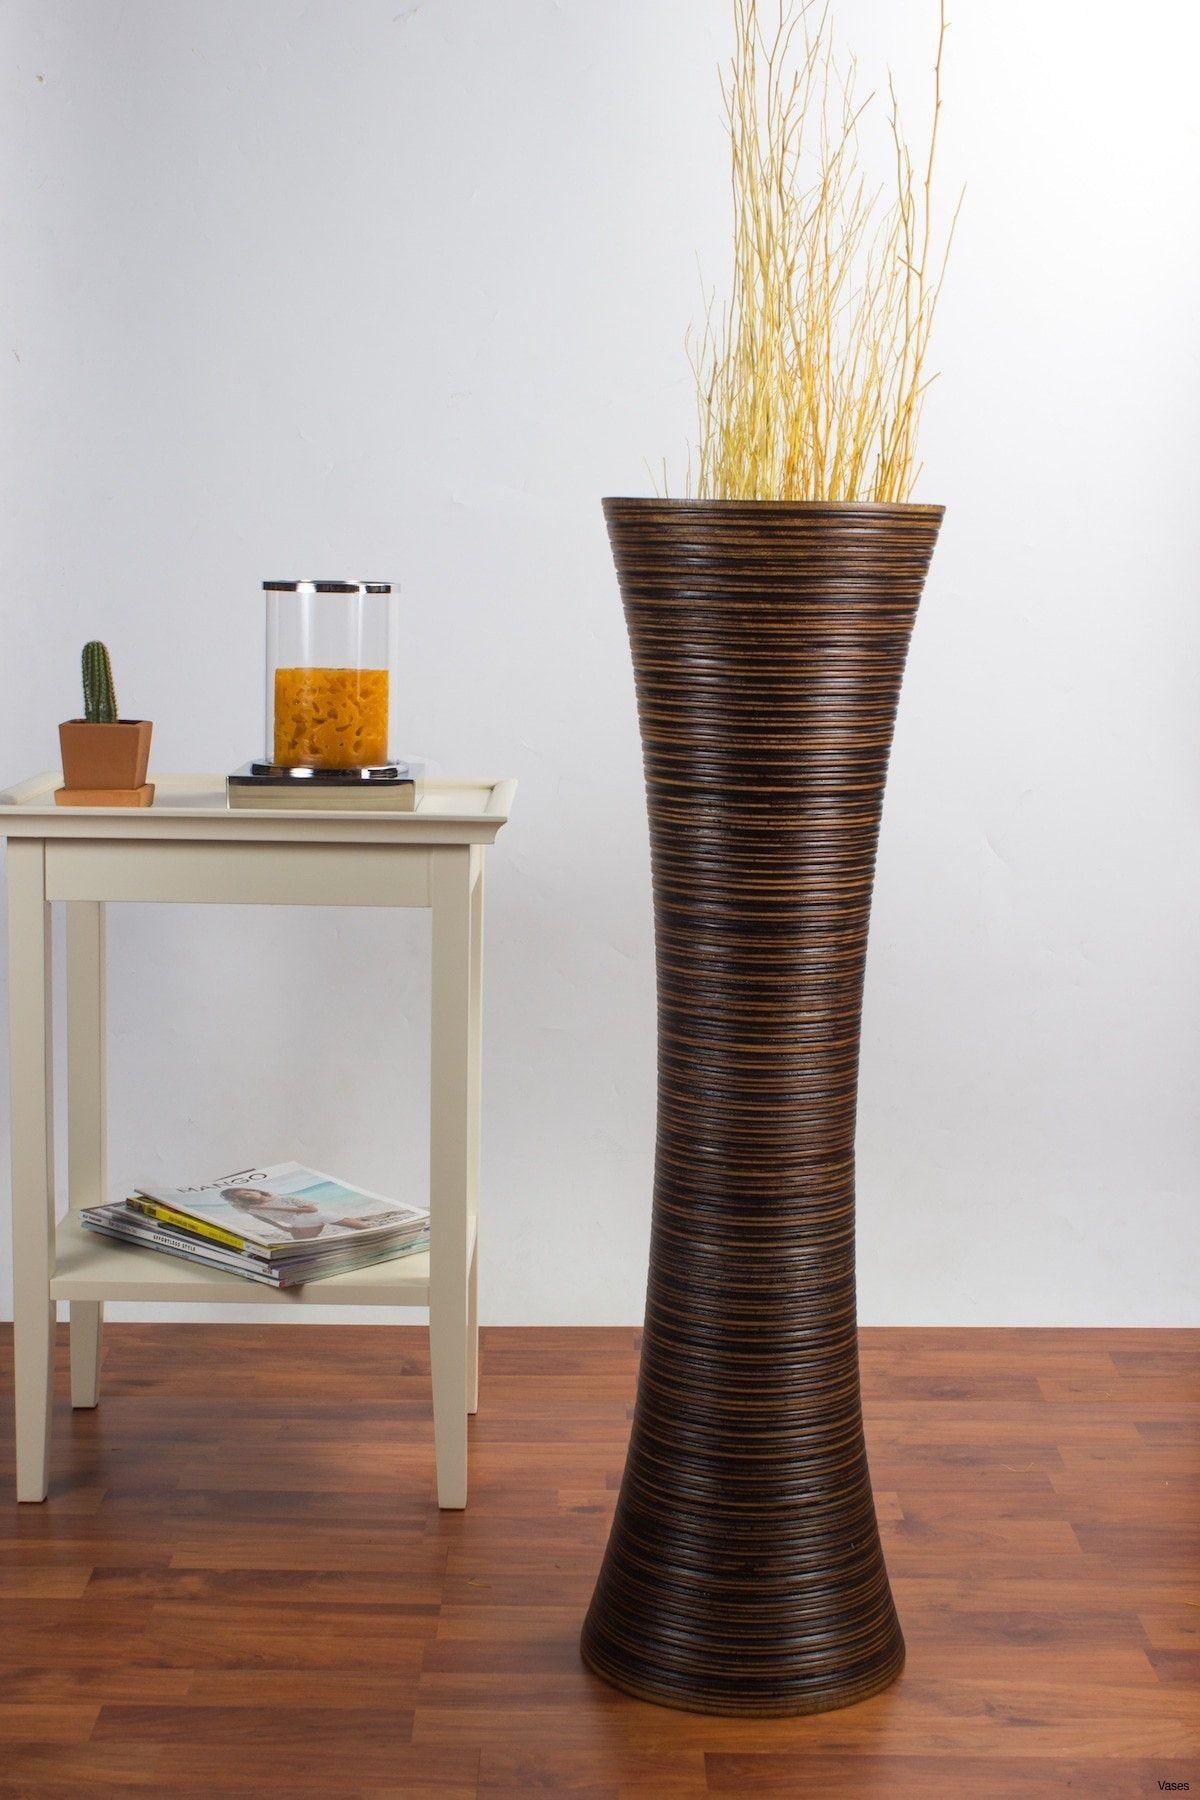 home decor floor vases of 30 large floor vase the weekly world intended for decorative floor vases fresh d dkbrw 5749 1h vases tall brown i 0d